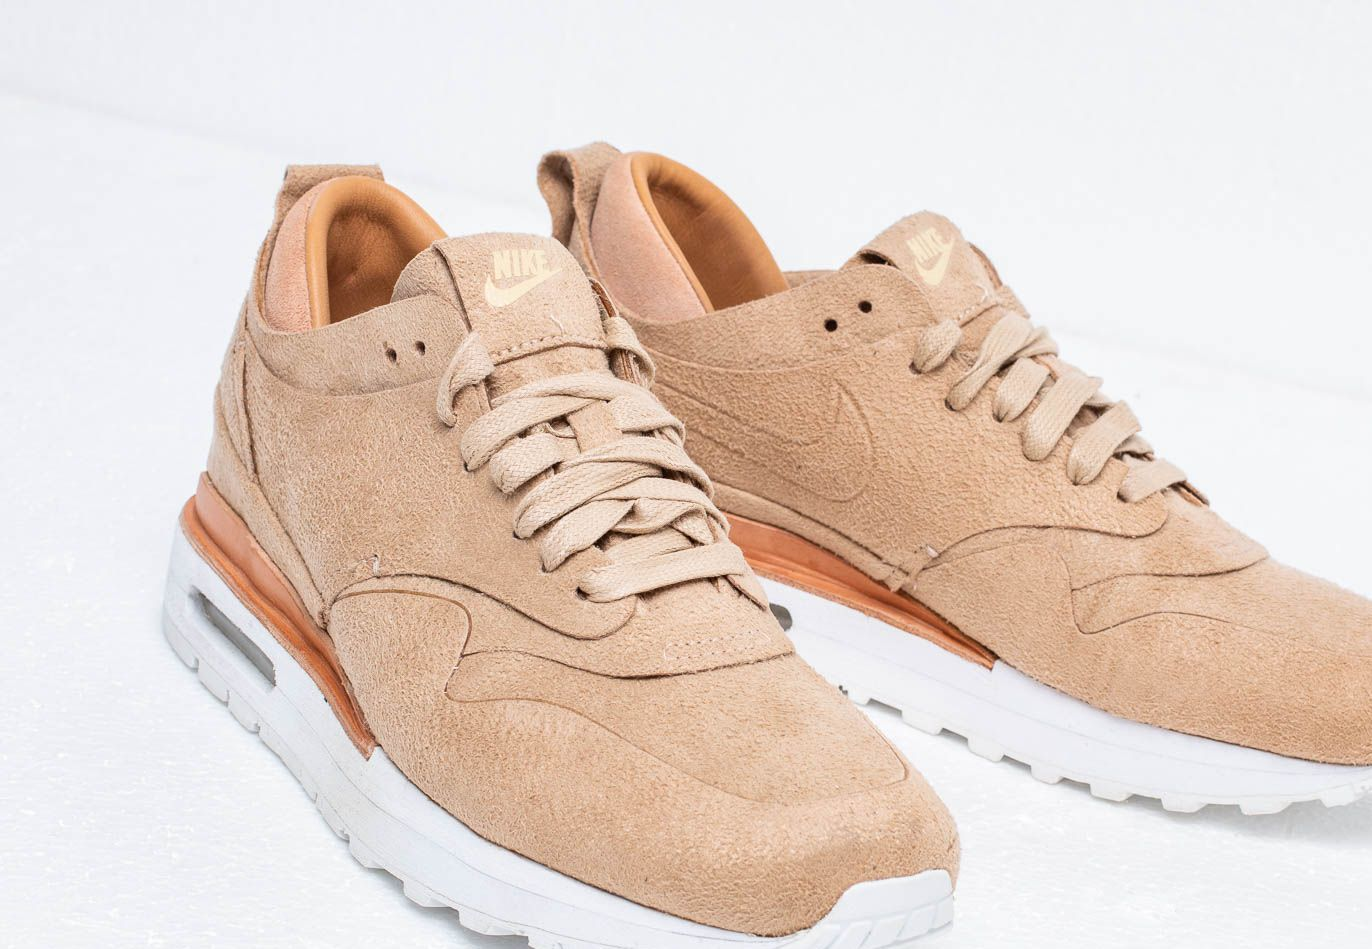 Nike Wmns Air Max 1 Royal Linen/ Linen-Summit White, Brown